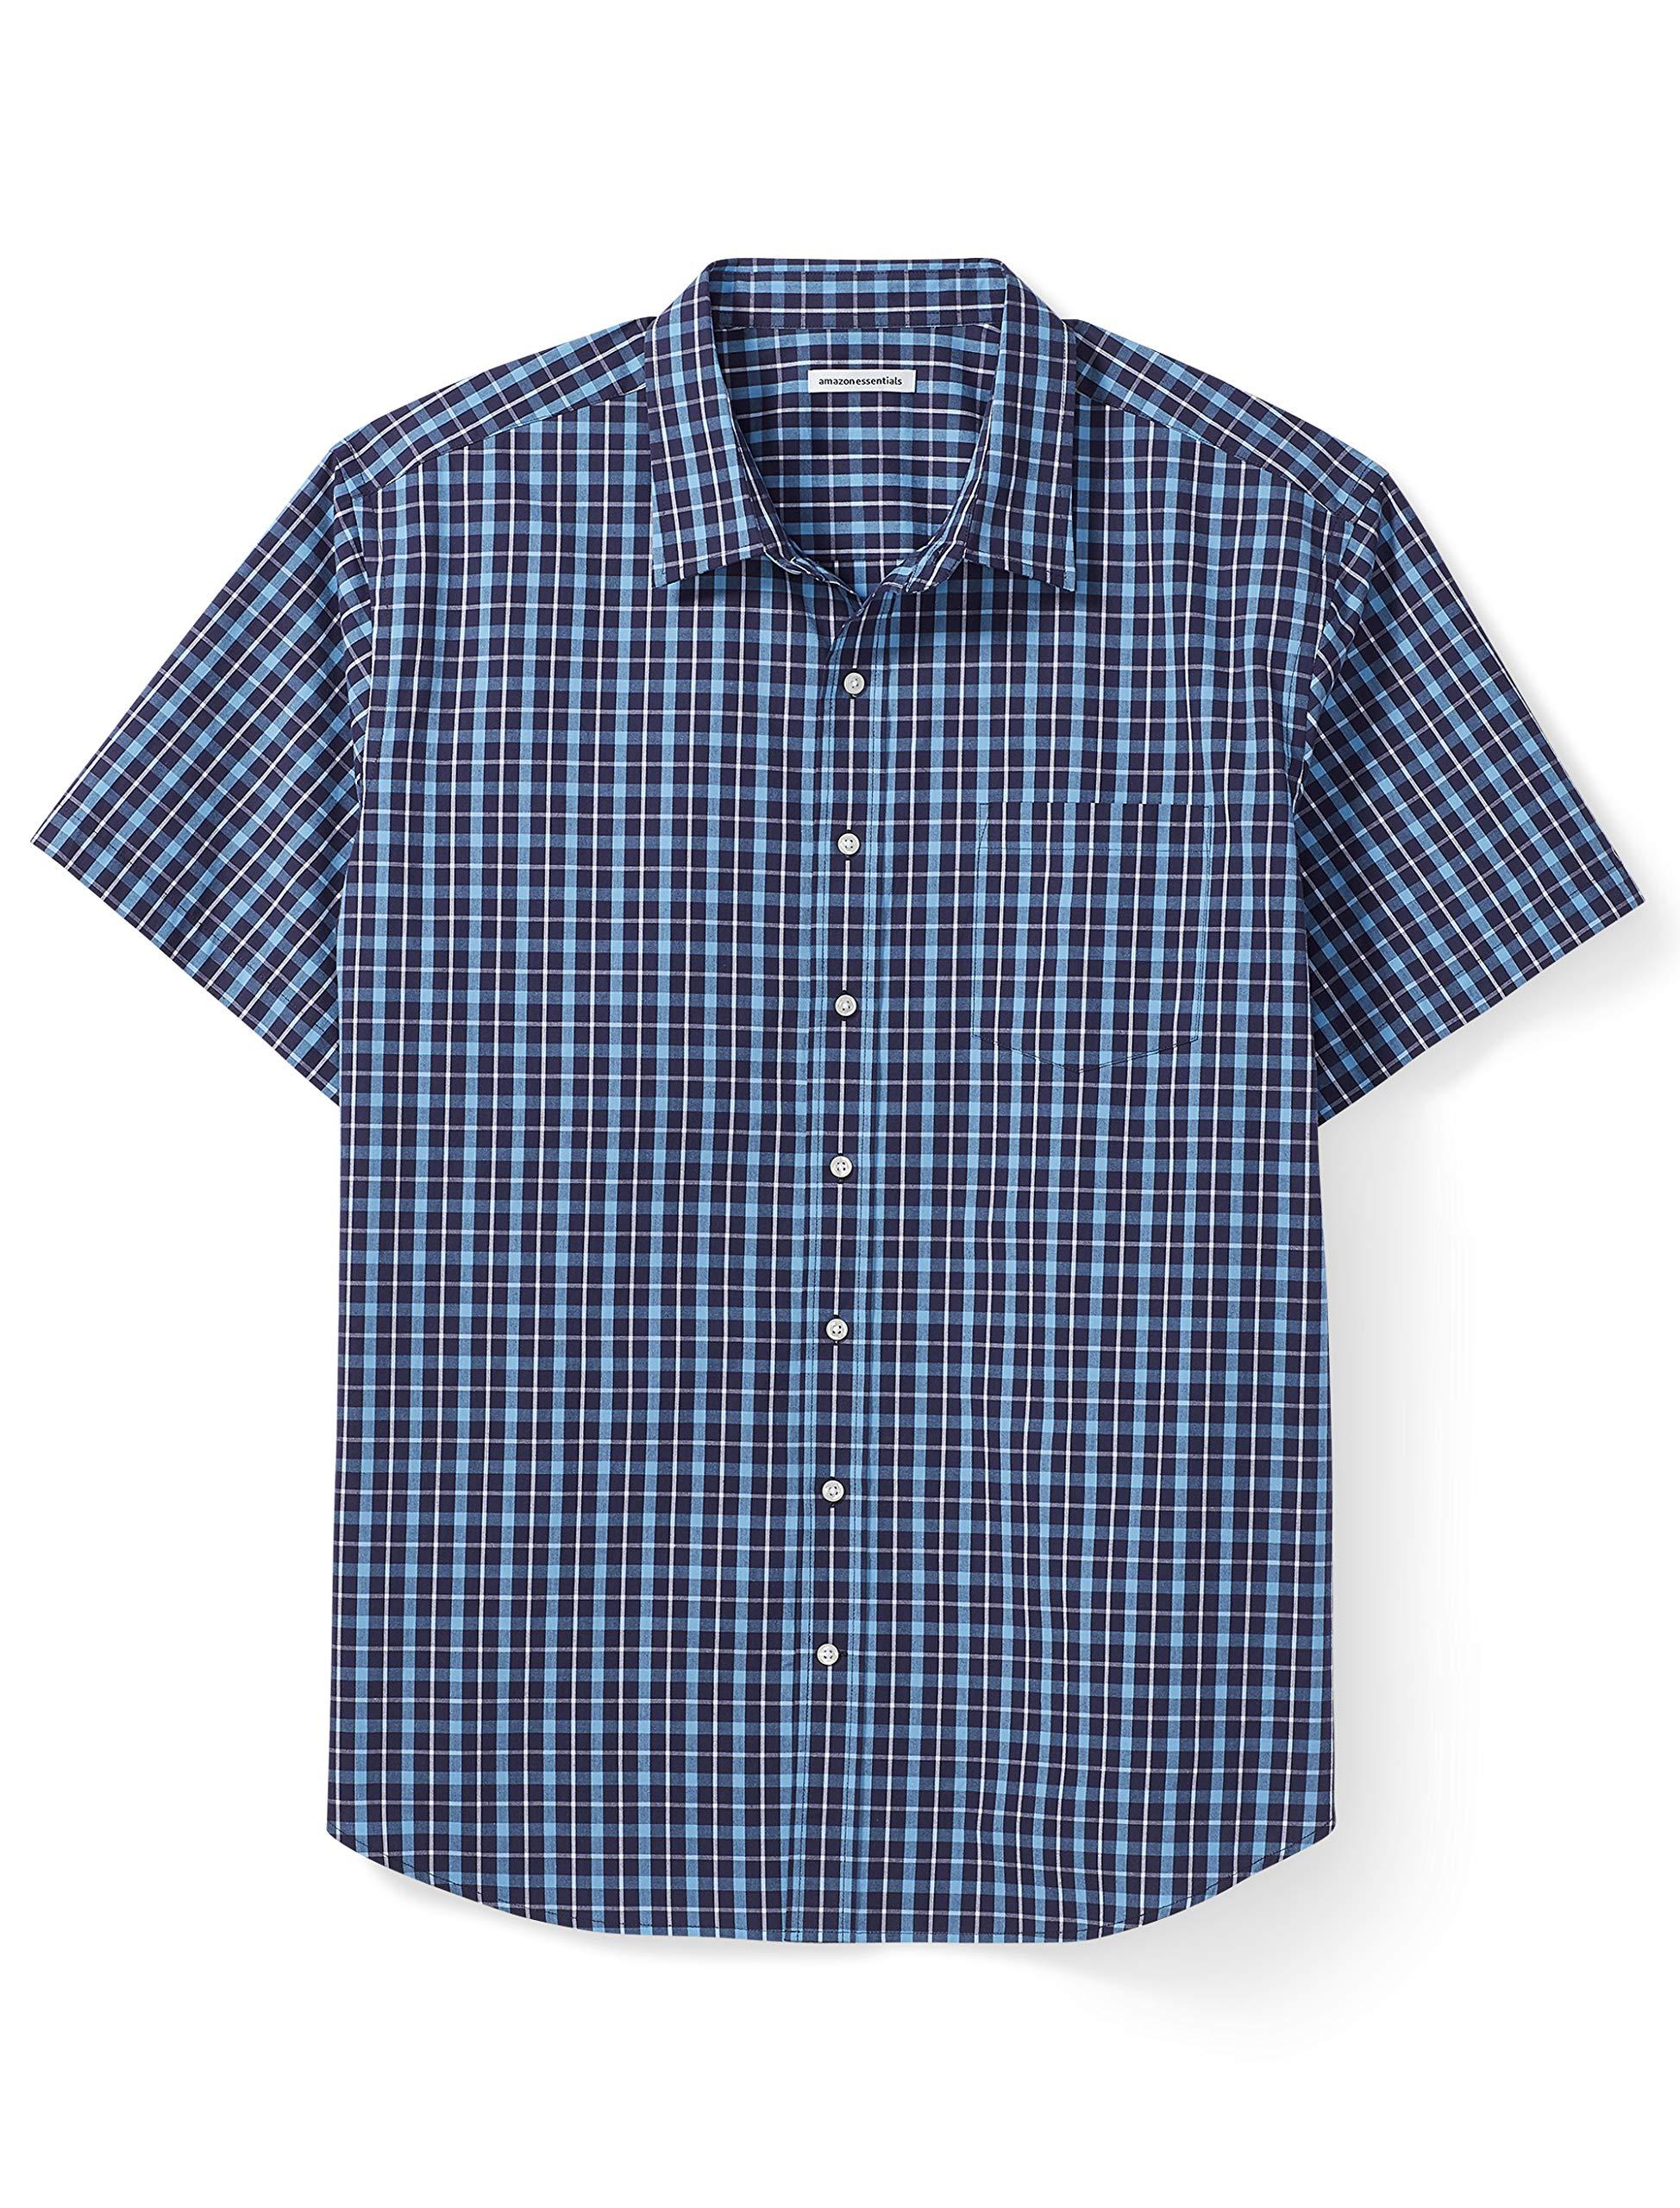 Amazon Essentials Men's Big & Tall Short-Sleeve Plaid Shirt fit by DXL, Navy, 3X by Amazon Essentials